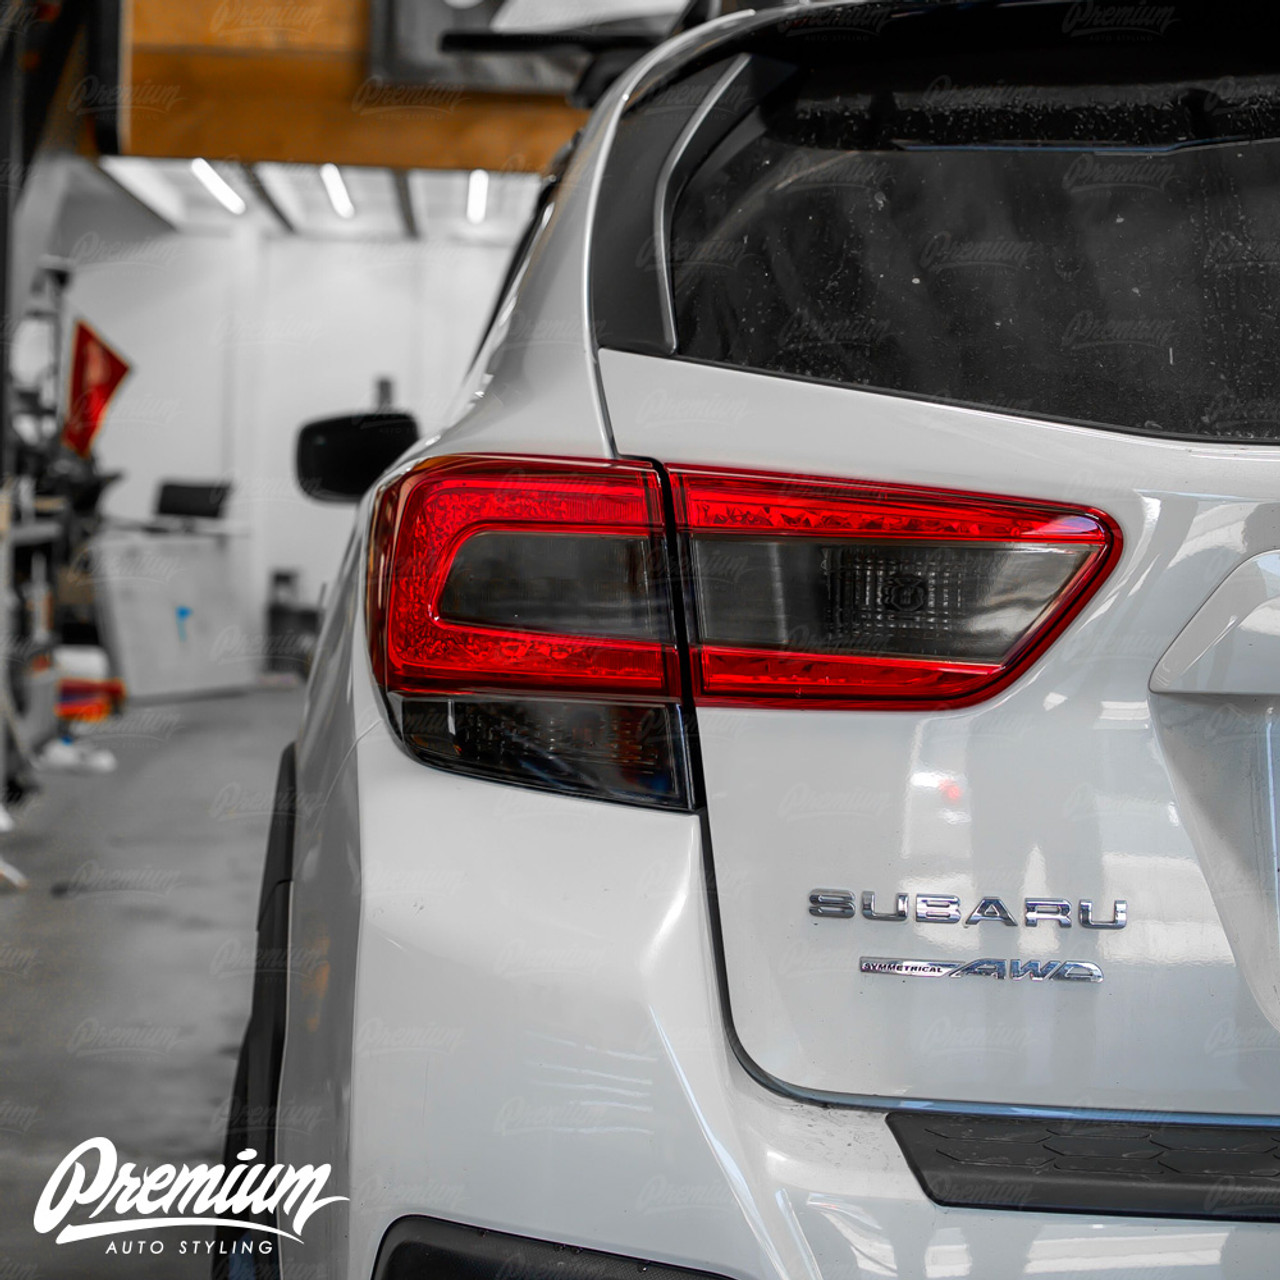 Tail Light Smoke Tint Overlay Kit Full Stealth V2 2018 2020 Subaru Crosstrek Xv Premium Auto Styling